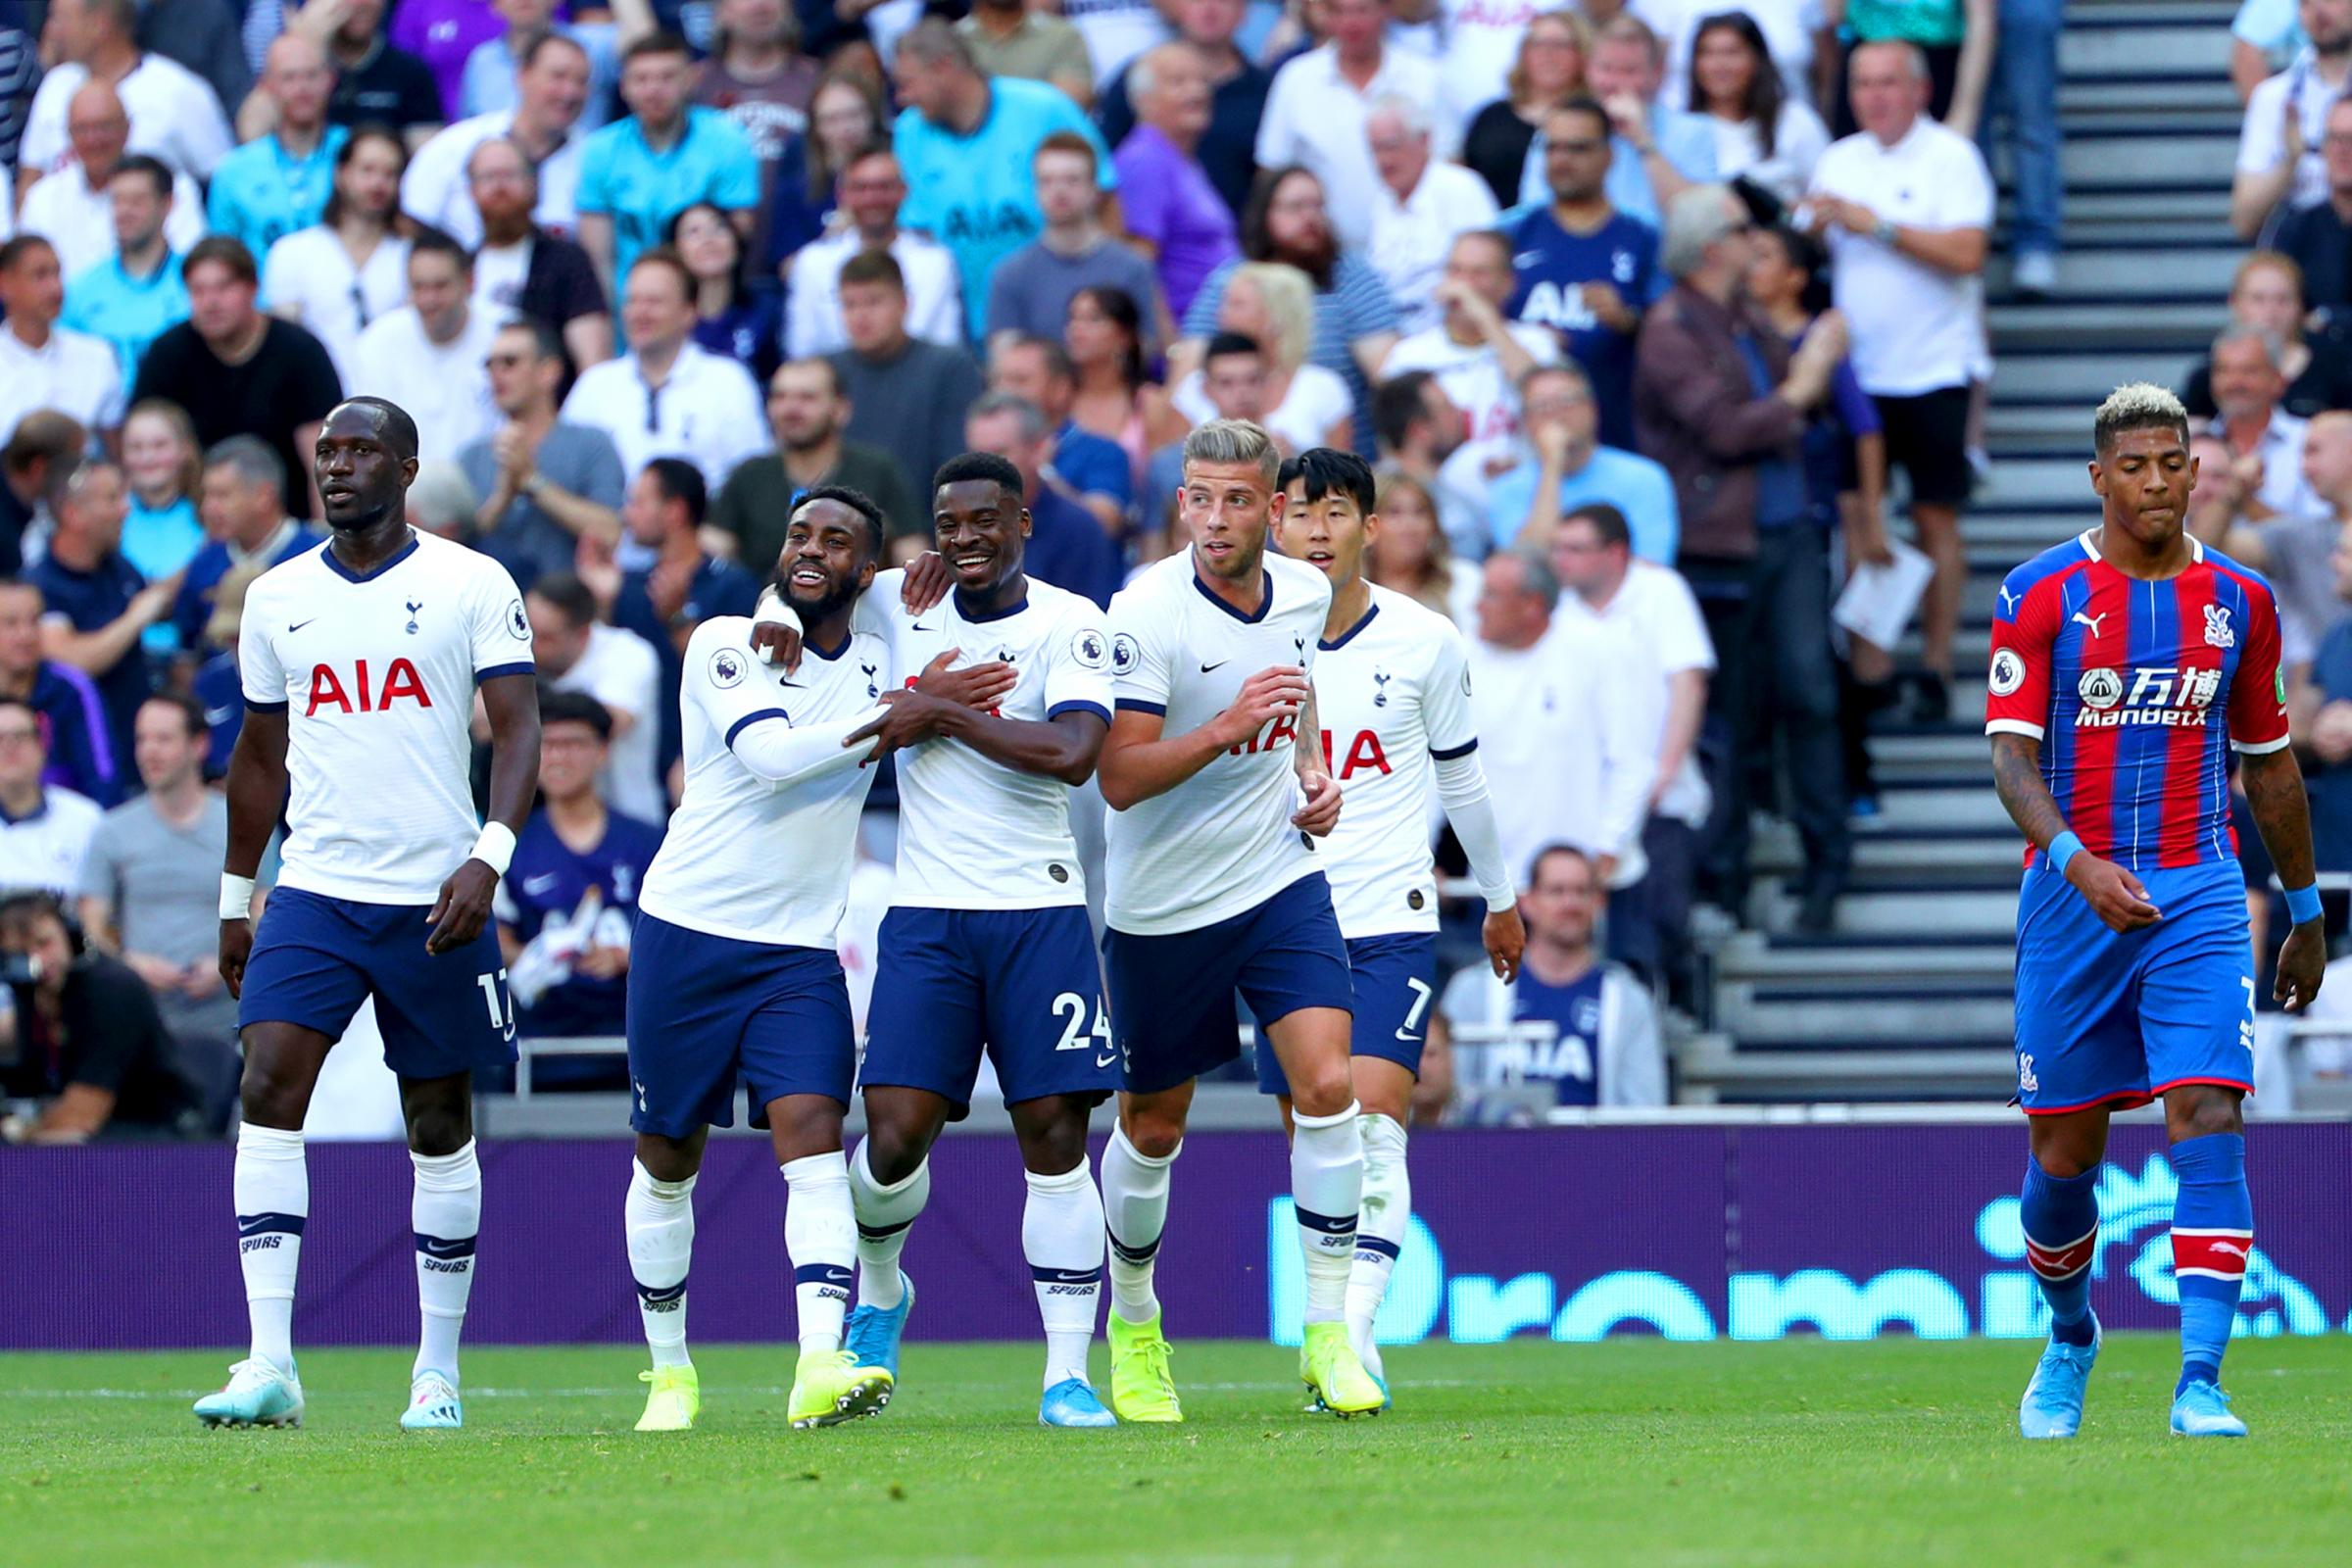 Crystal Palace's 4-0 defeat at Tottenham highlights van Aanholt's frailties